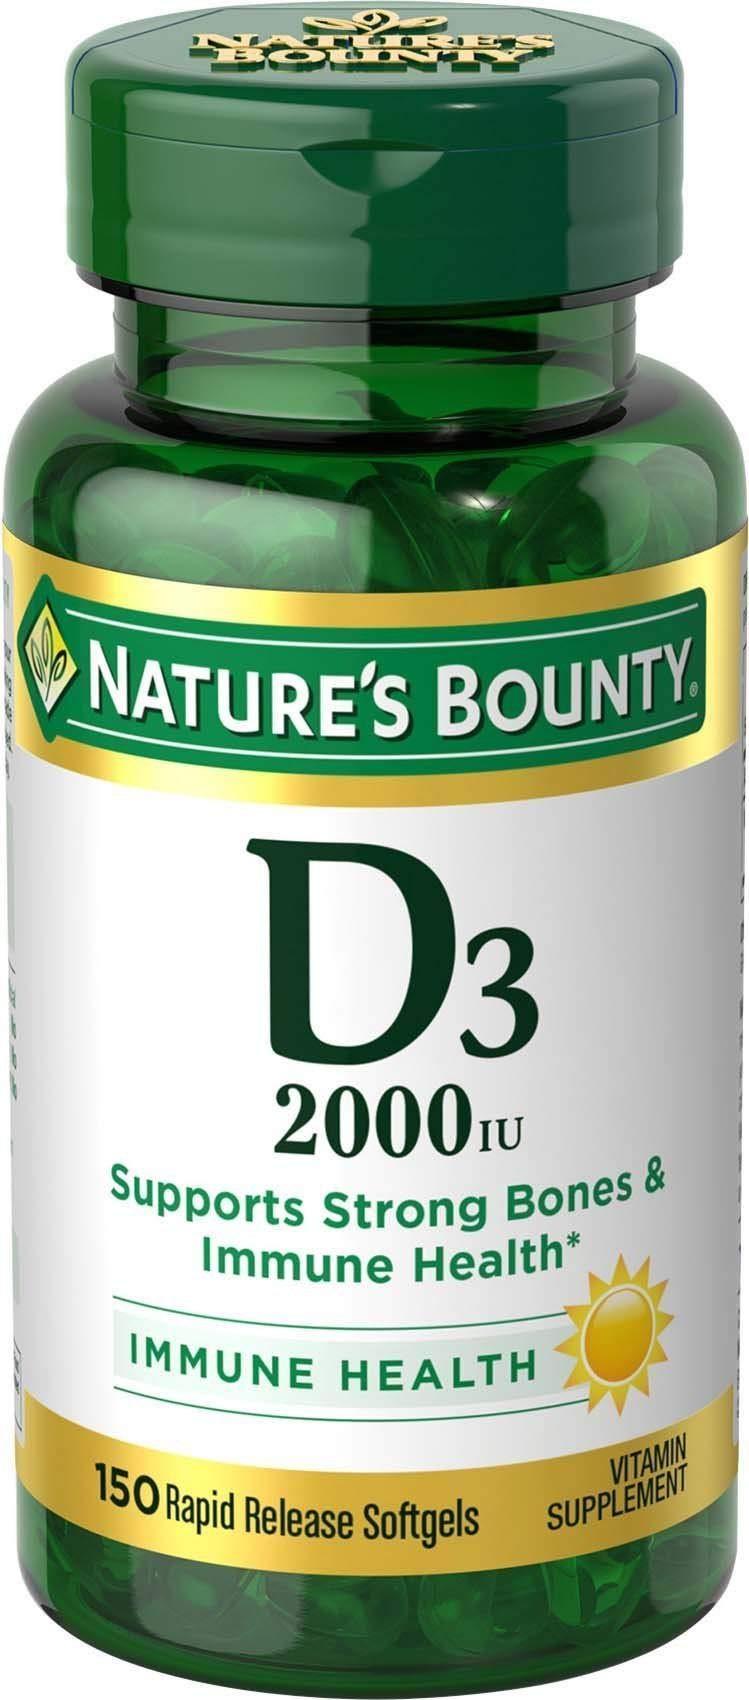 Vitamin D by Nature's Bounty, Supports Immune Health & Bone Health, 2000IU Vitamin D3, 150 Softgels